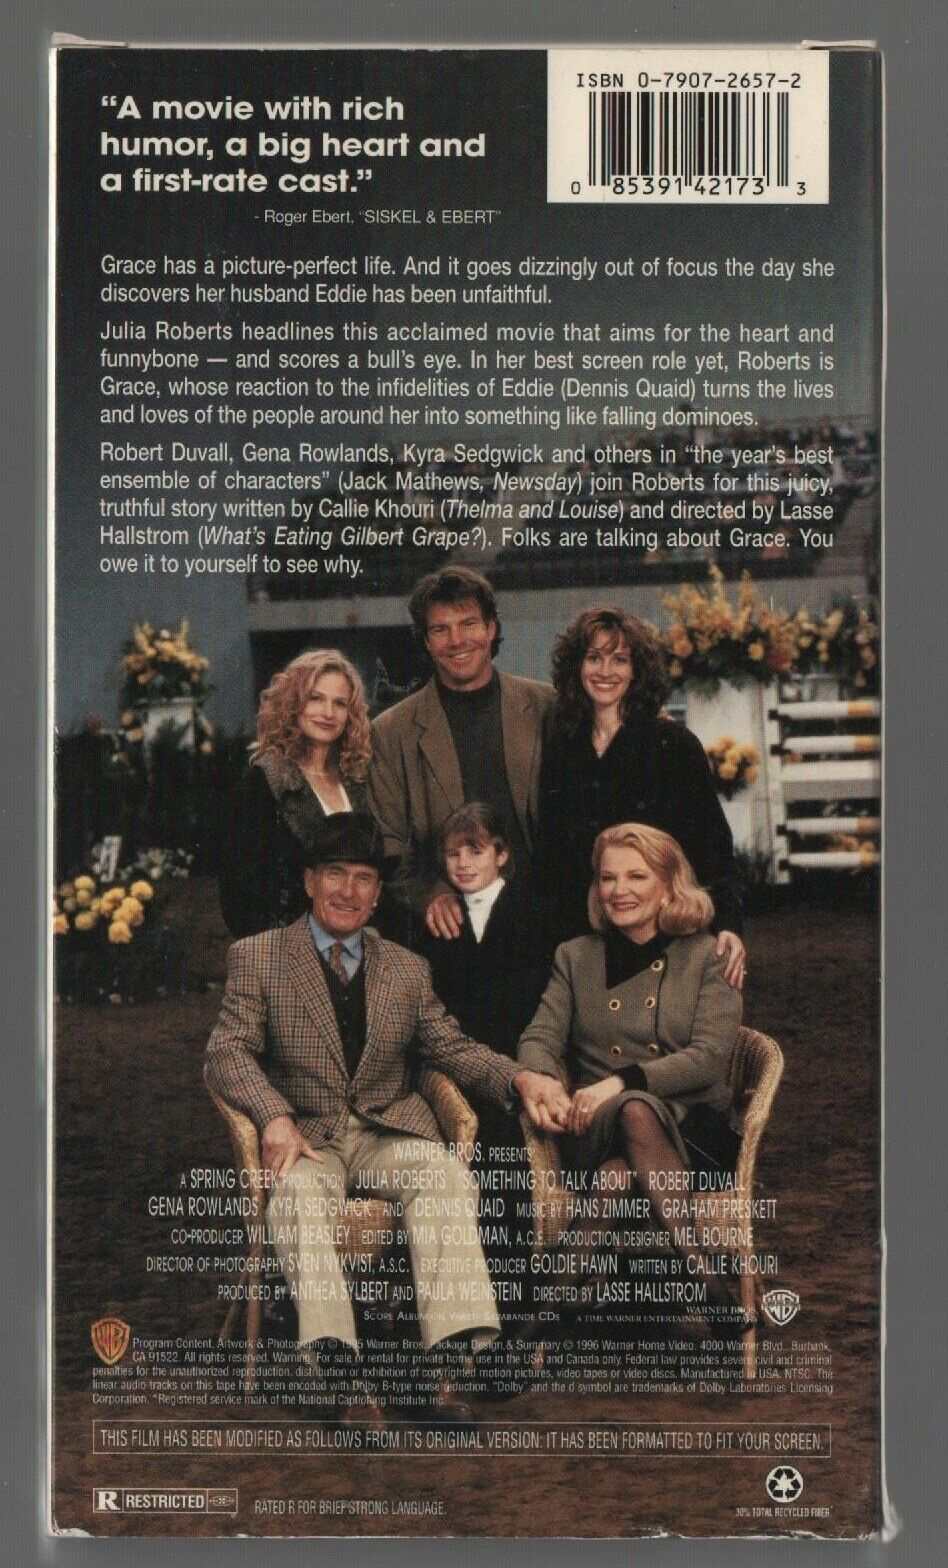 Something to Talk About - Julia Roberts, Robert Duvail - Warner Bros - VHS 14217 image 2